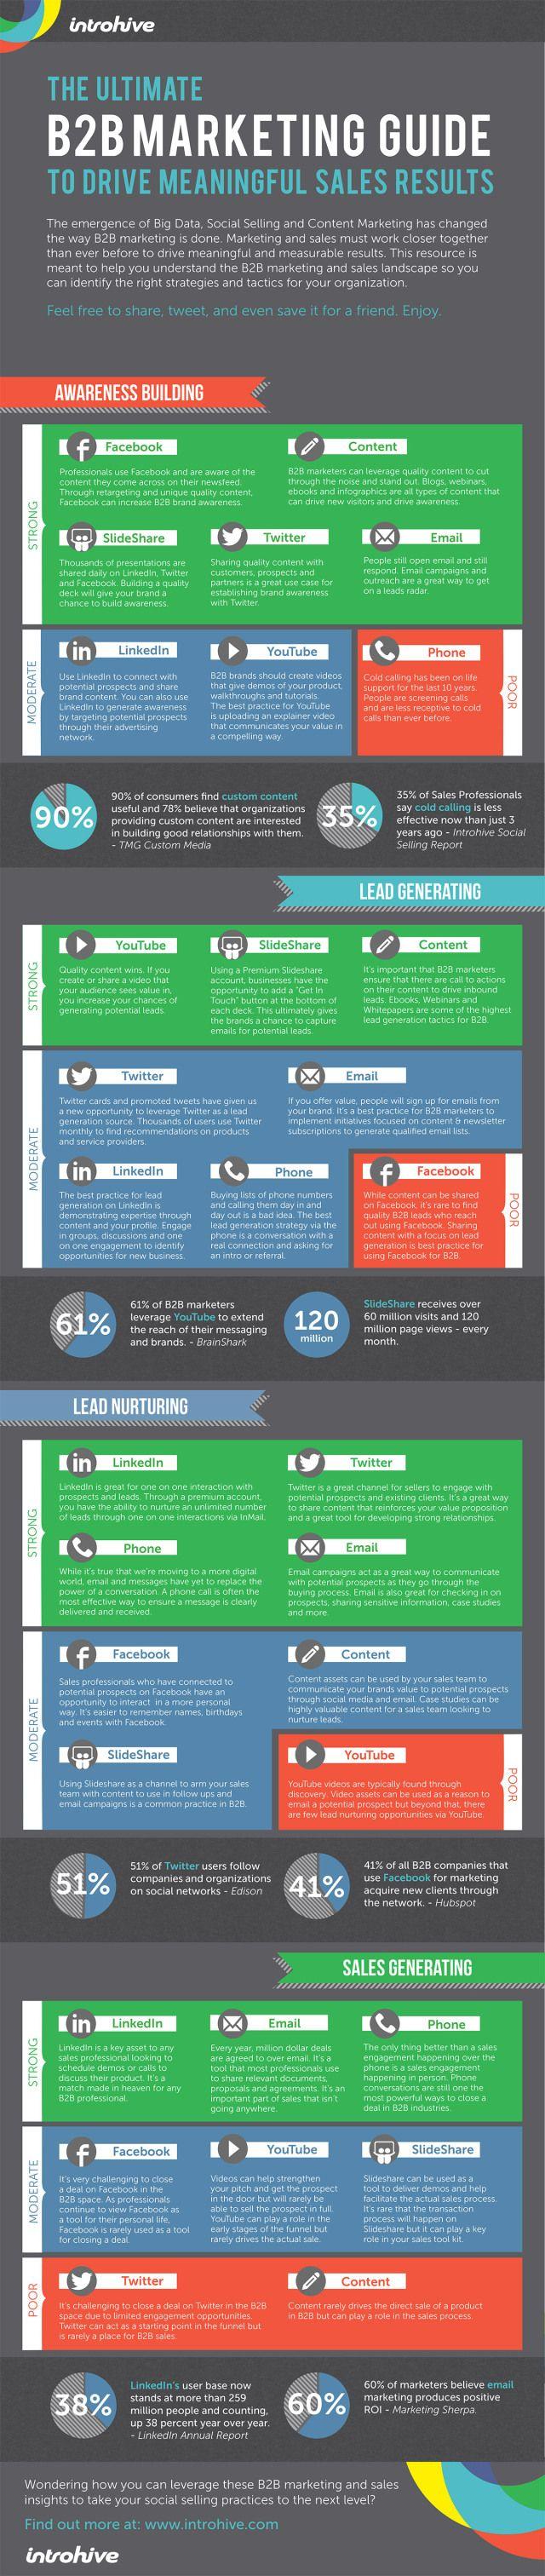 The Ultimate B2b Marketing Guide #infografia #infographic #marketing